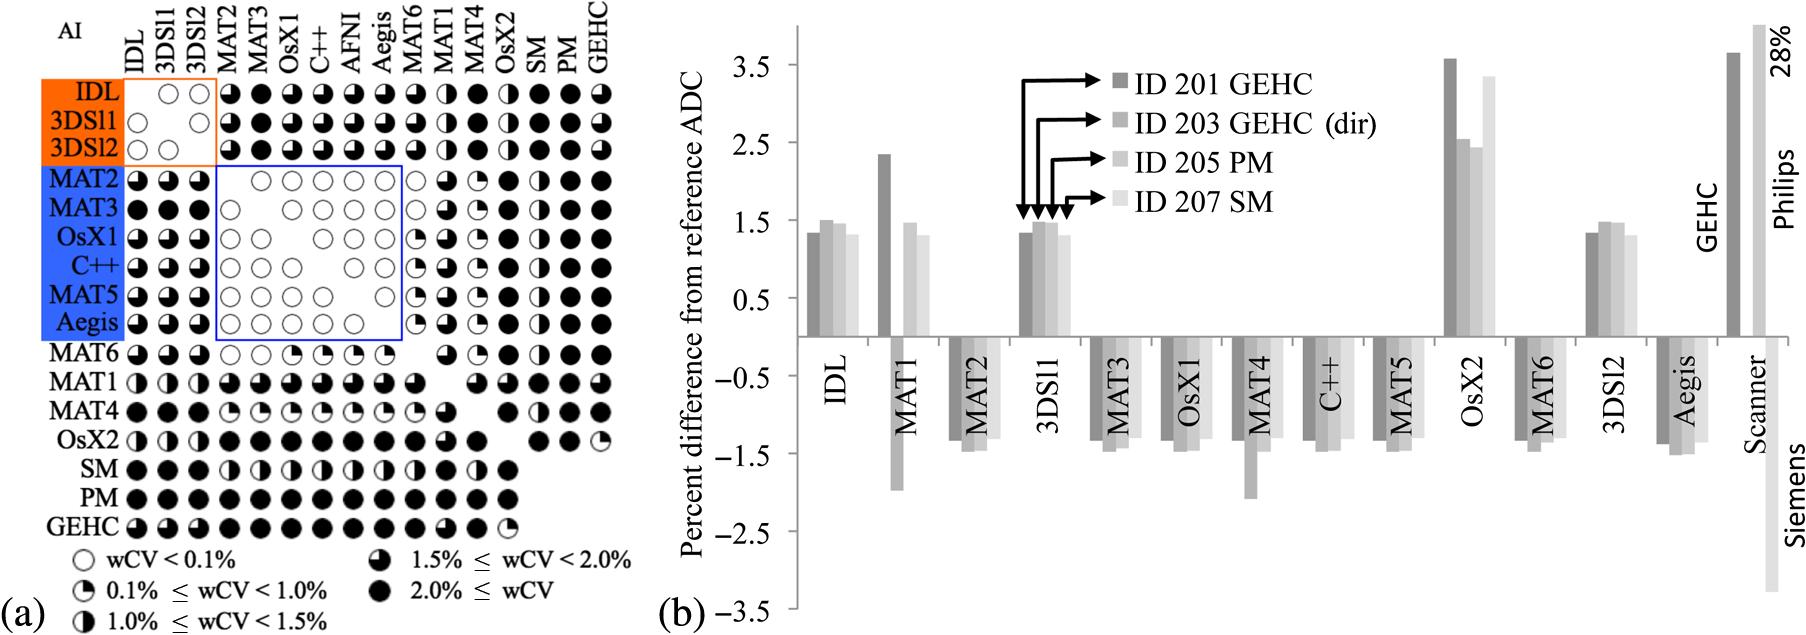 Multisite concordance of apparent diffusion coefficient